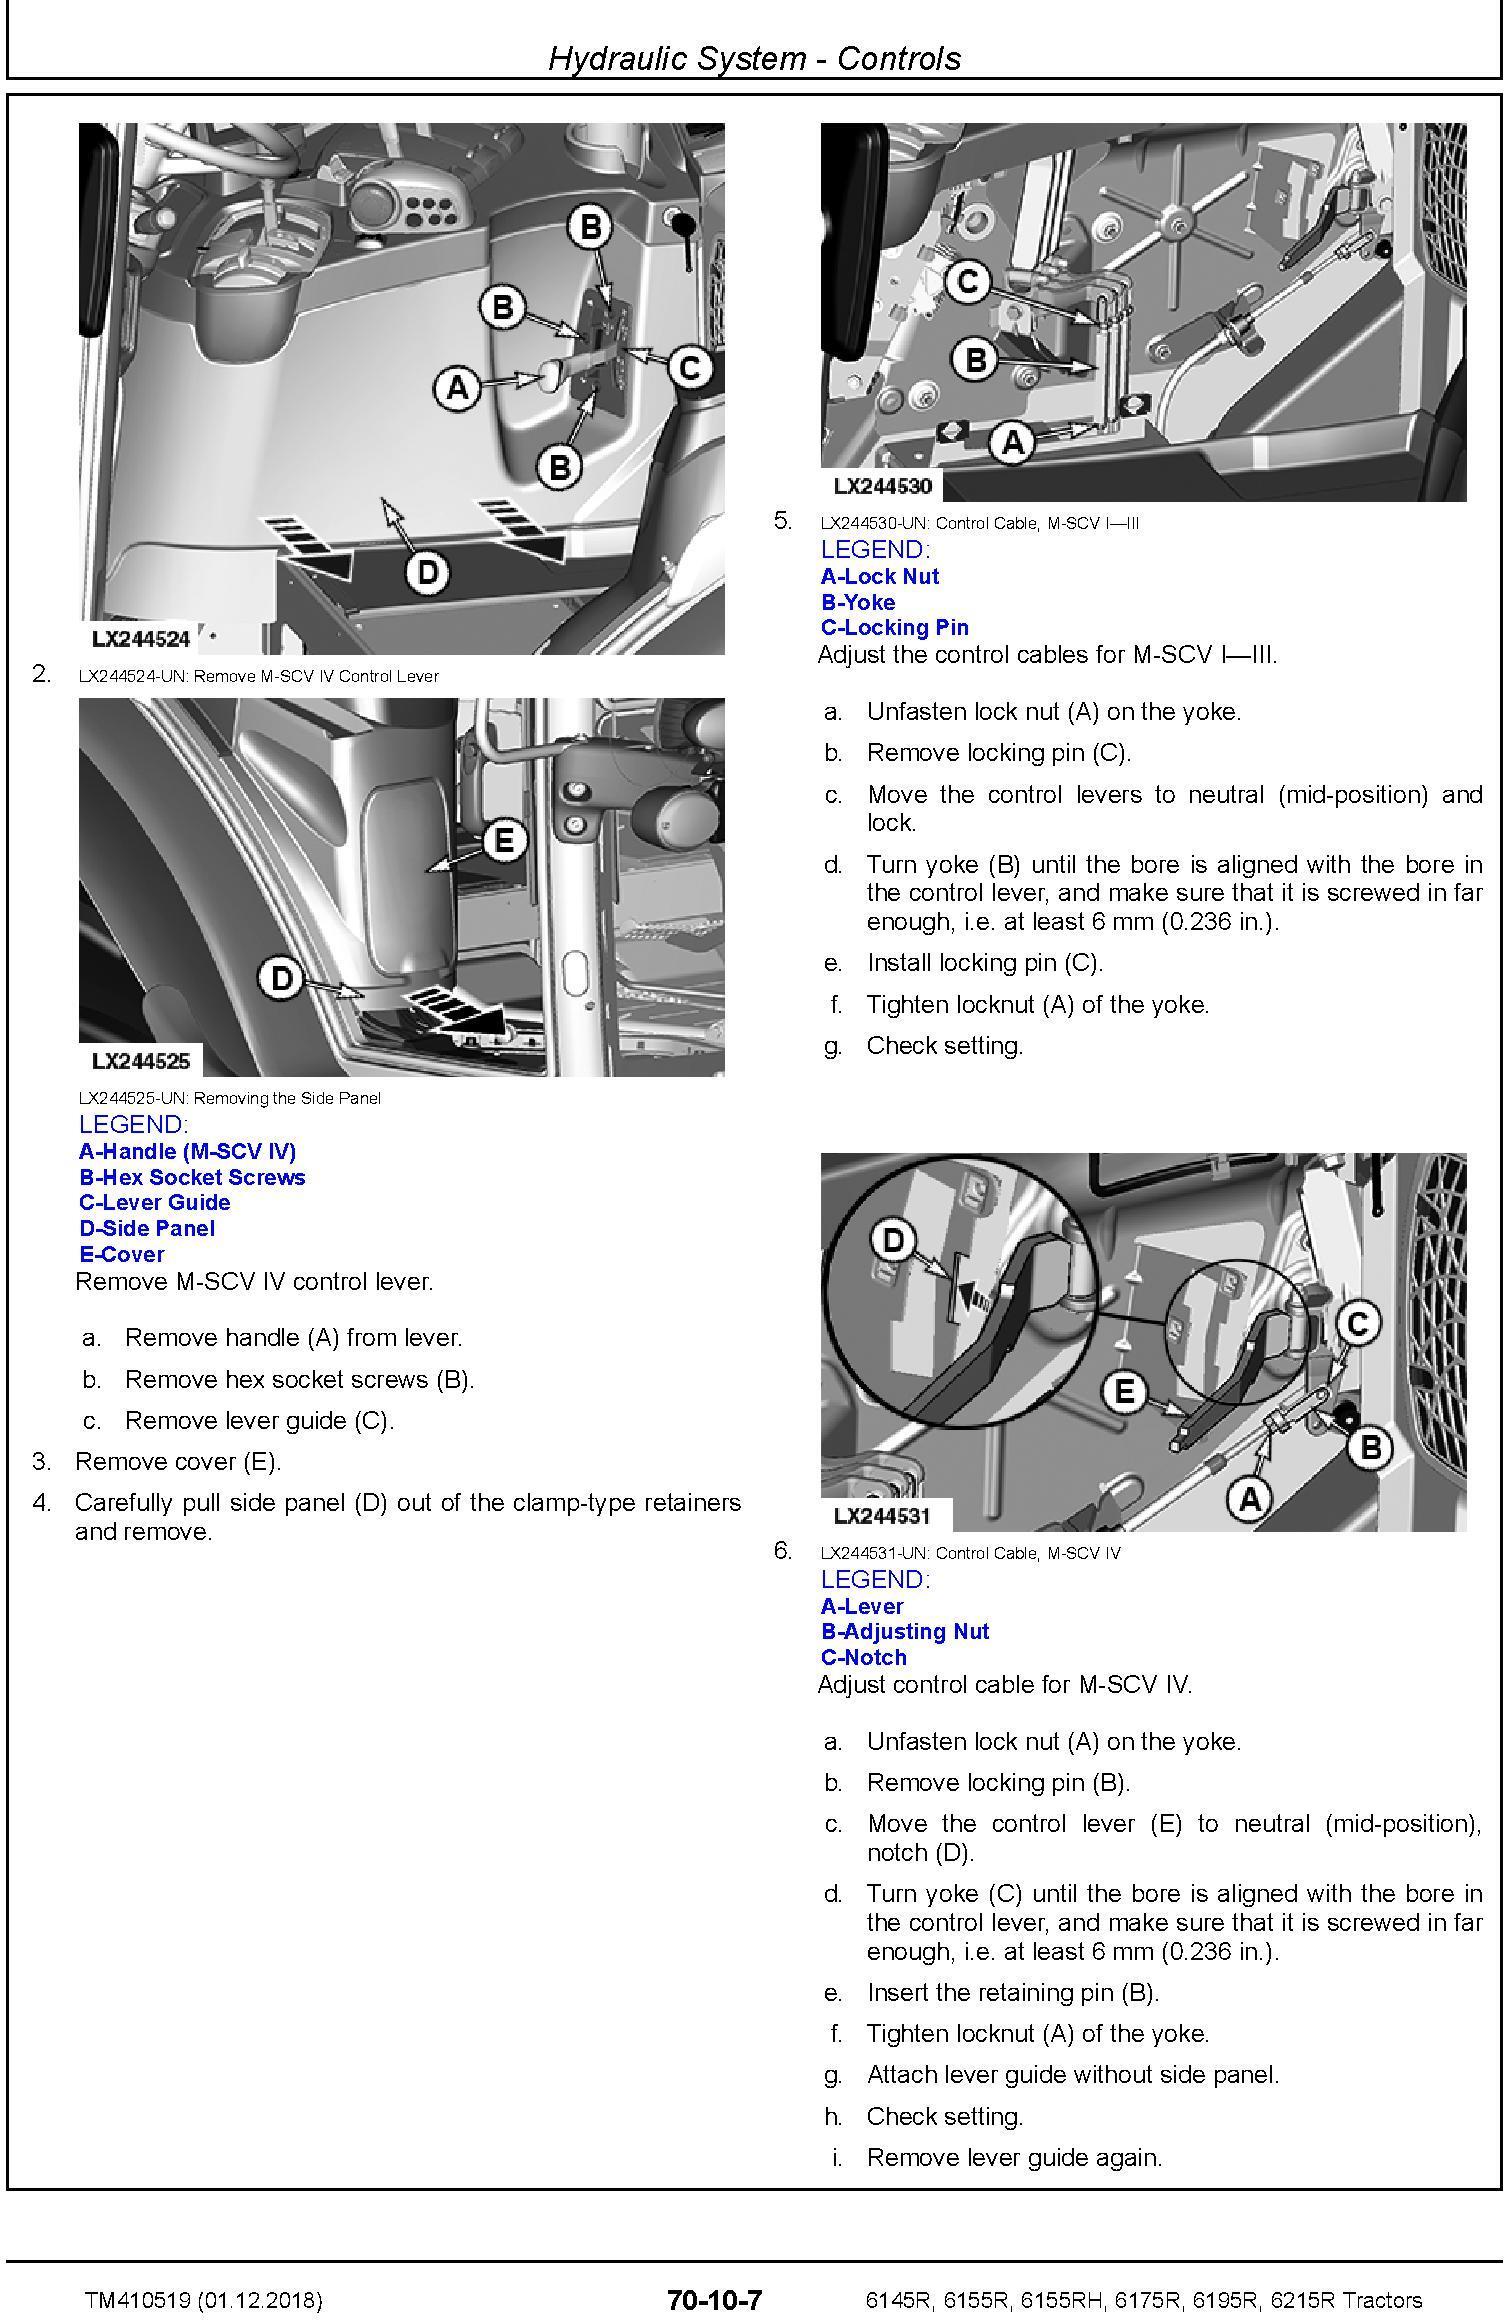 John Deere 6145R, 6155R, 6155RH, 6175R, 6195R, 6215R MY18 Tractor Repair Technical Manual (TM410519) - 3